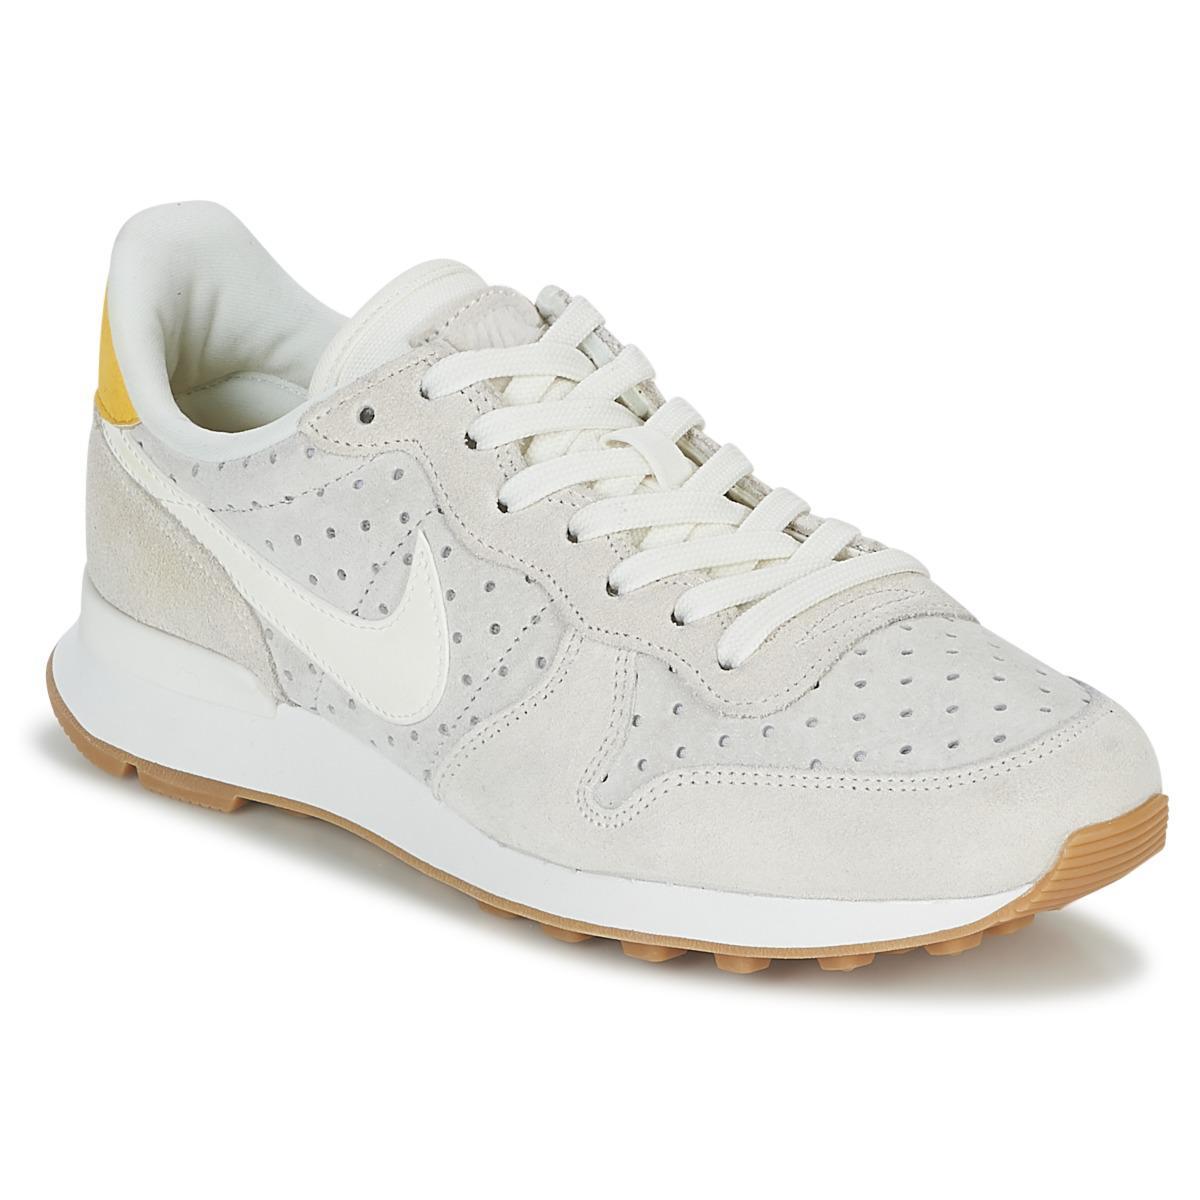 Nike INTERNATIONALIST PREMIUM W women's Shoes (Trainers) in Sale Free Shipping Amazon For Sale gGRUf